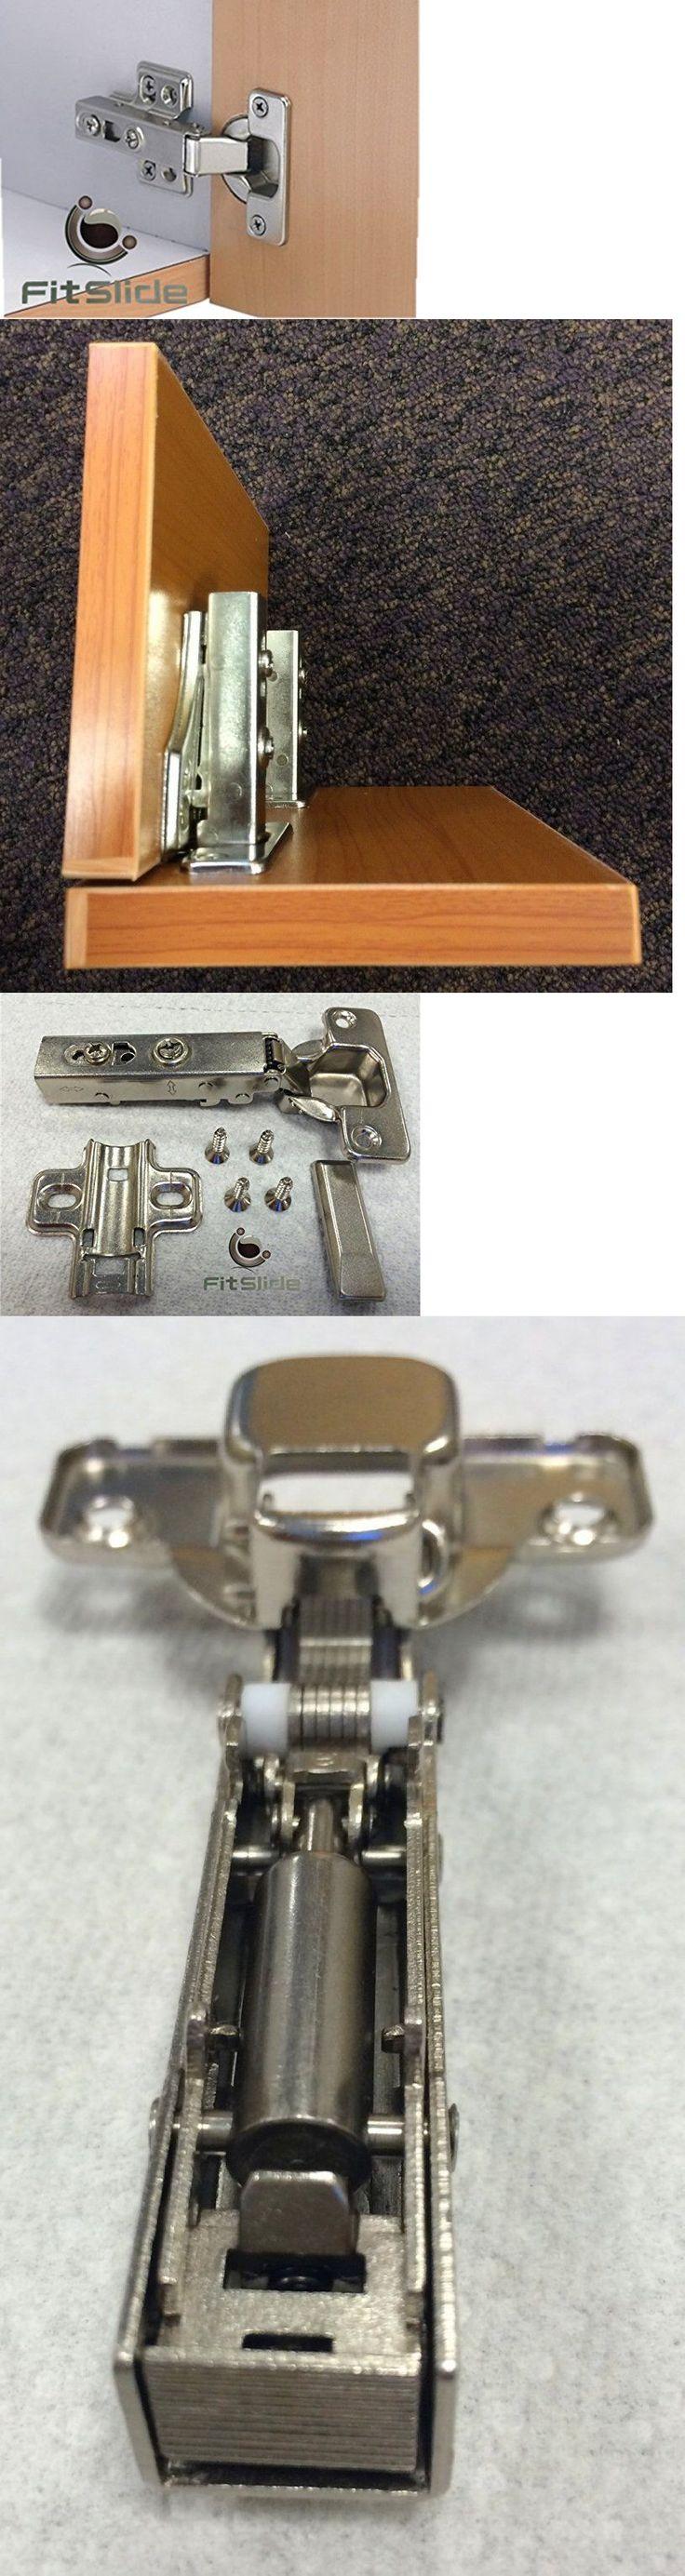 Door Hinges 66739: Fitslide Lot Of 20 E3-0-Ou Soft Close Hinge For Full Overlay Frameless Cabinet -> BUY IT NOW ONLY: $38 on eBay!